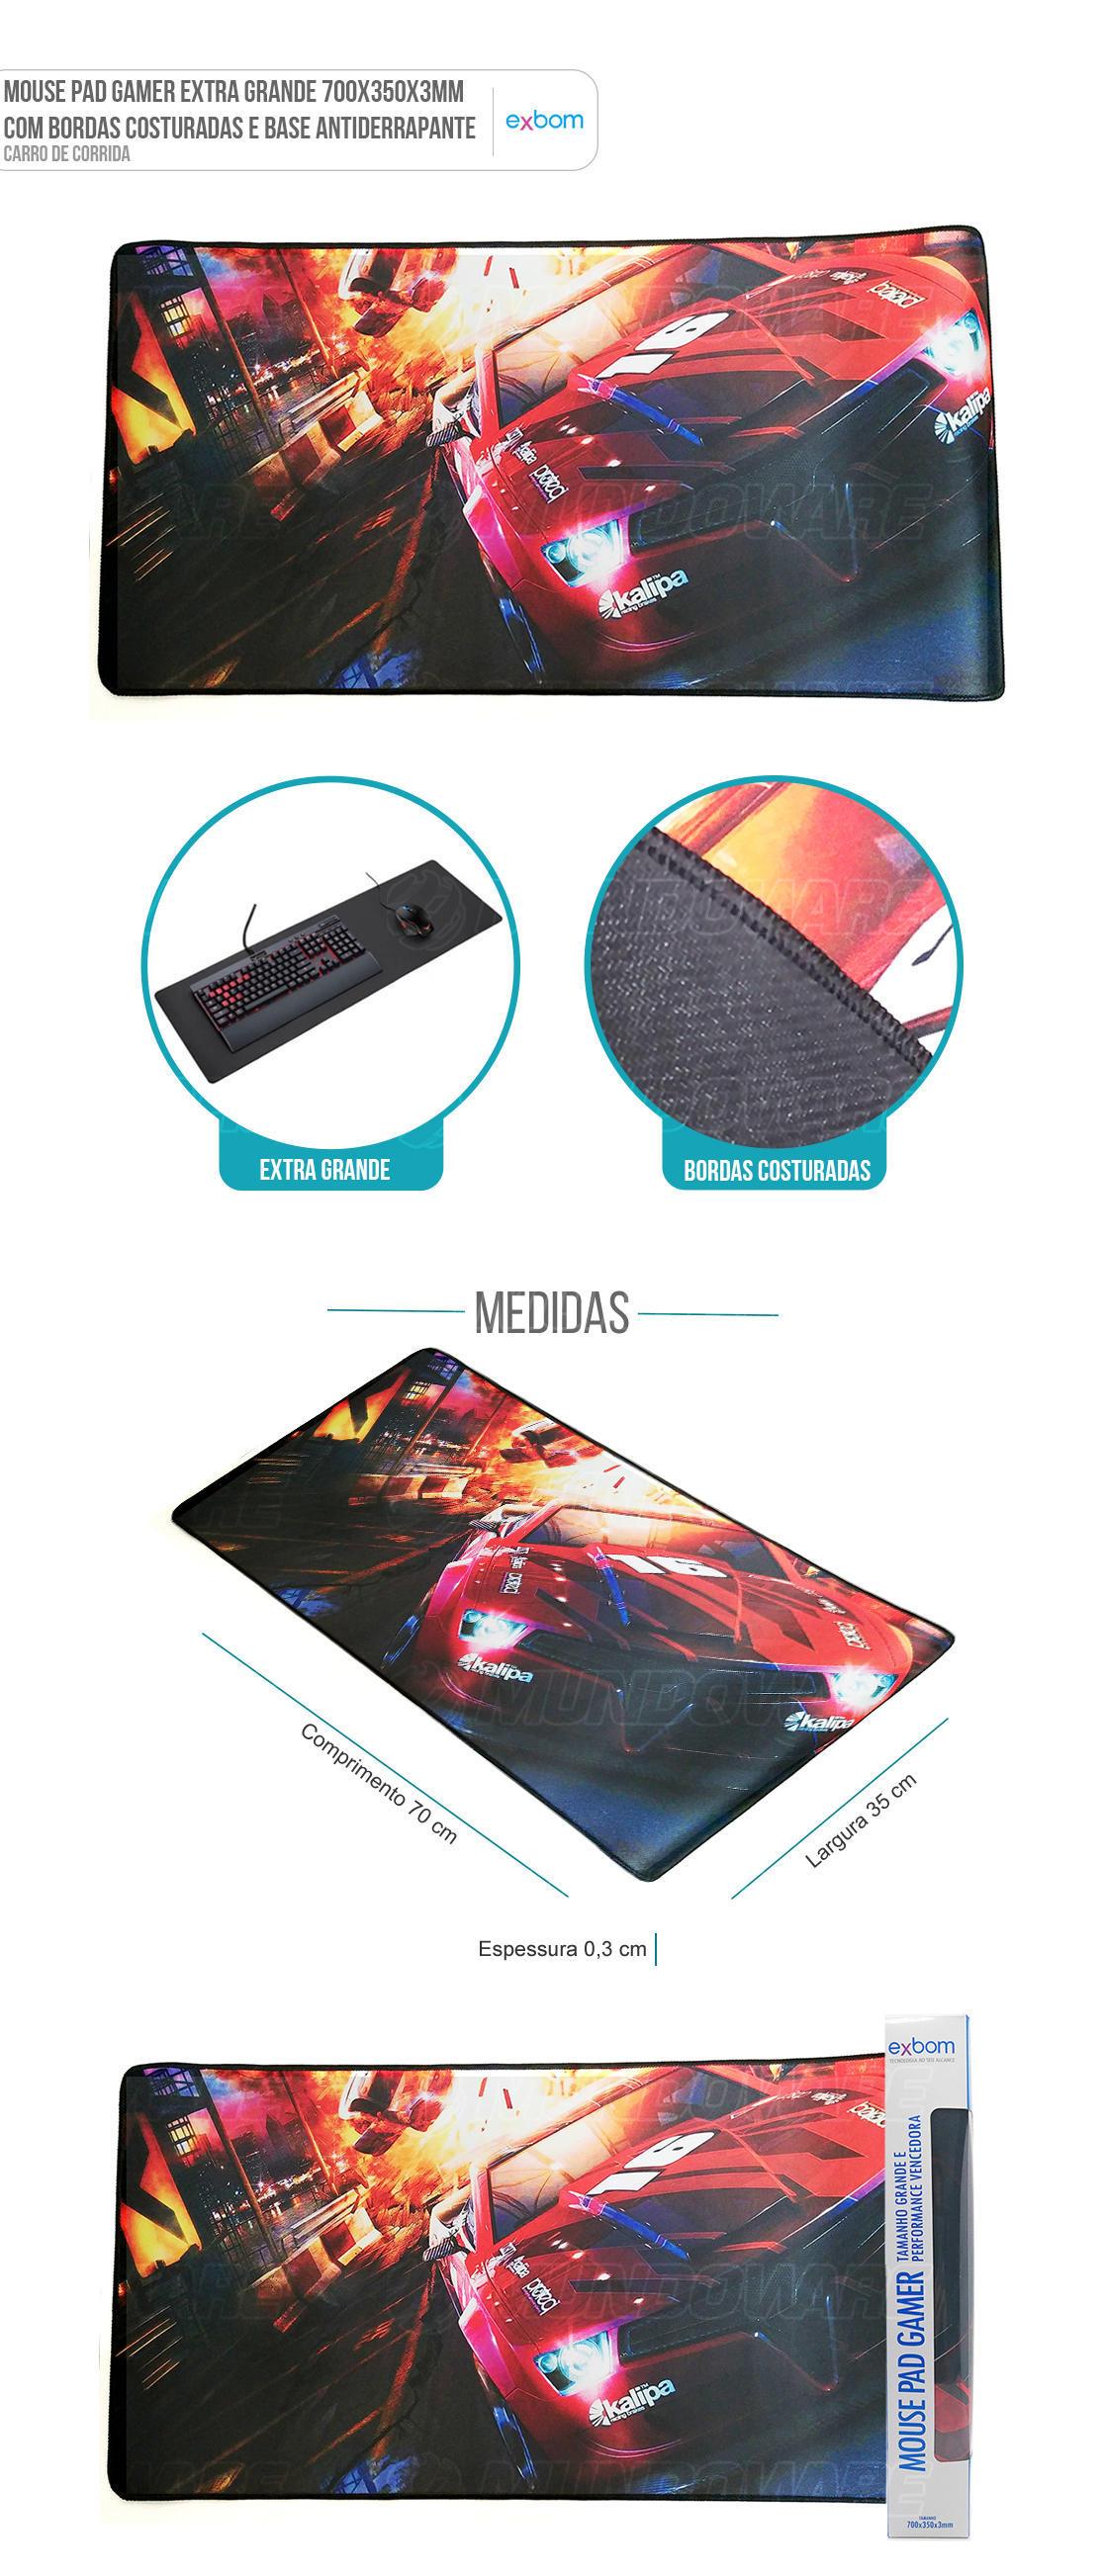 MousePad Gaming Extra Grande Large Gamer Carro de Corrida